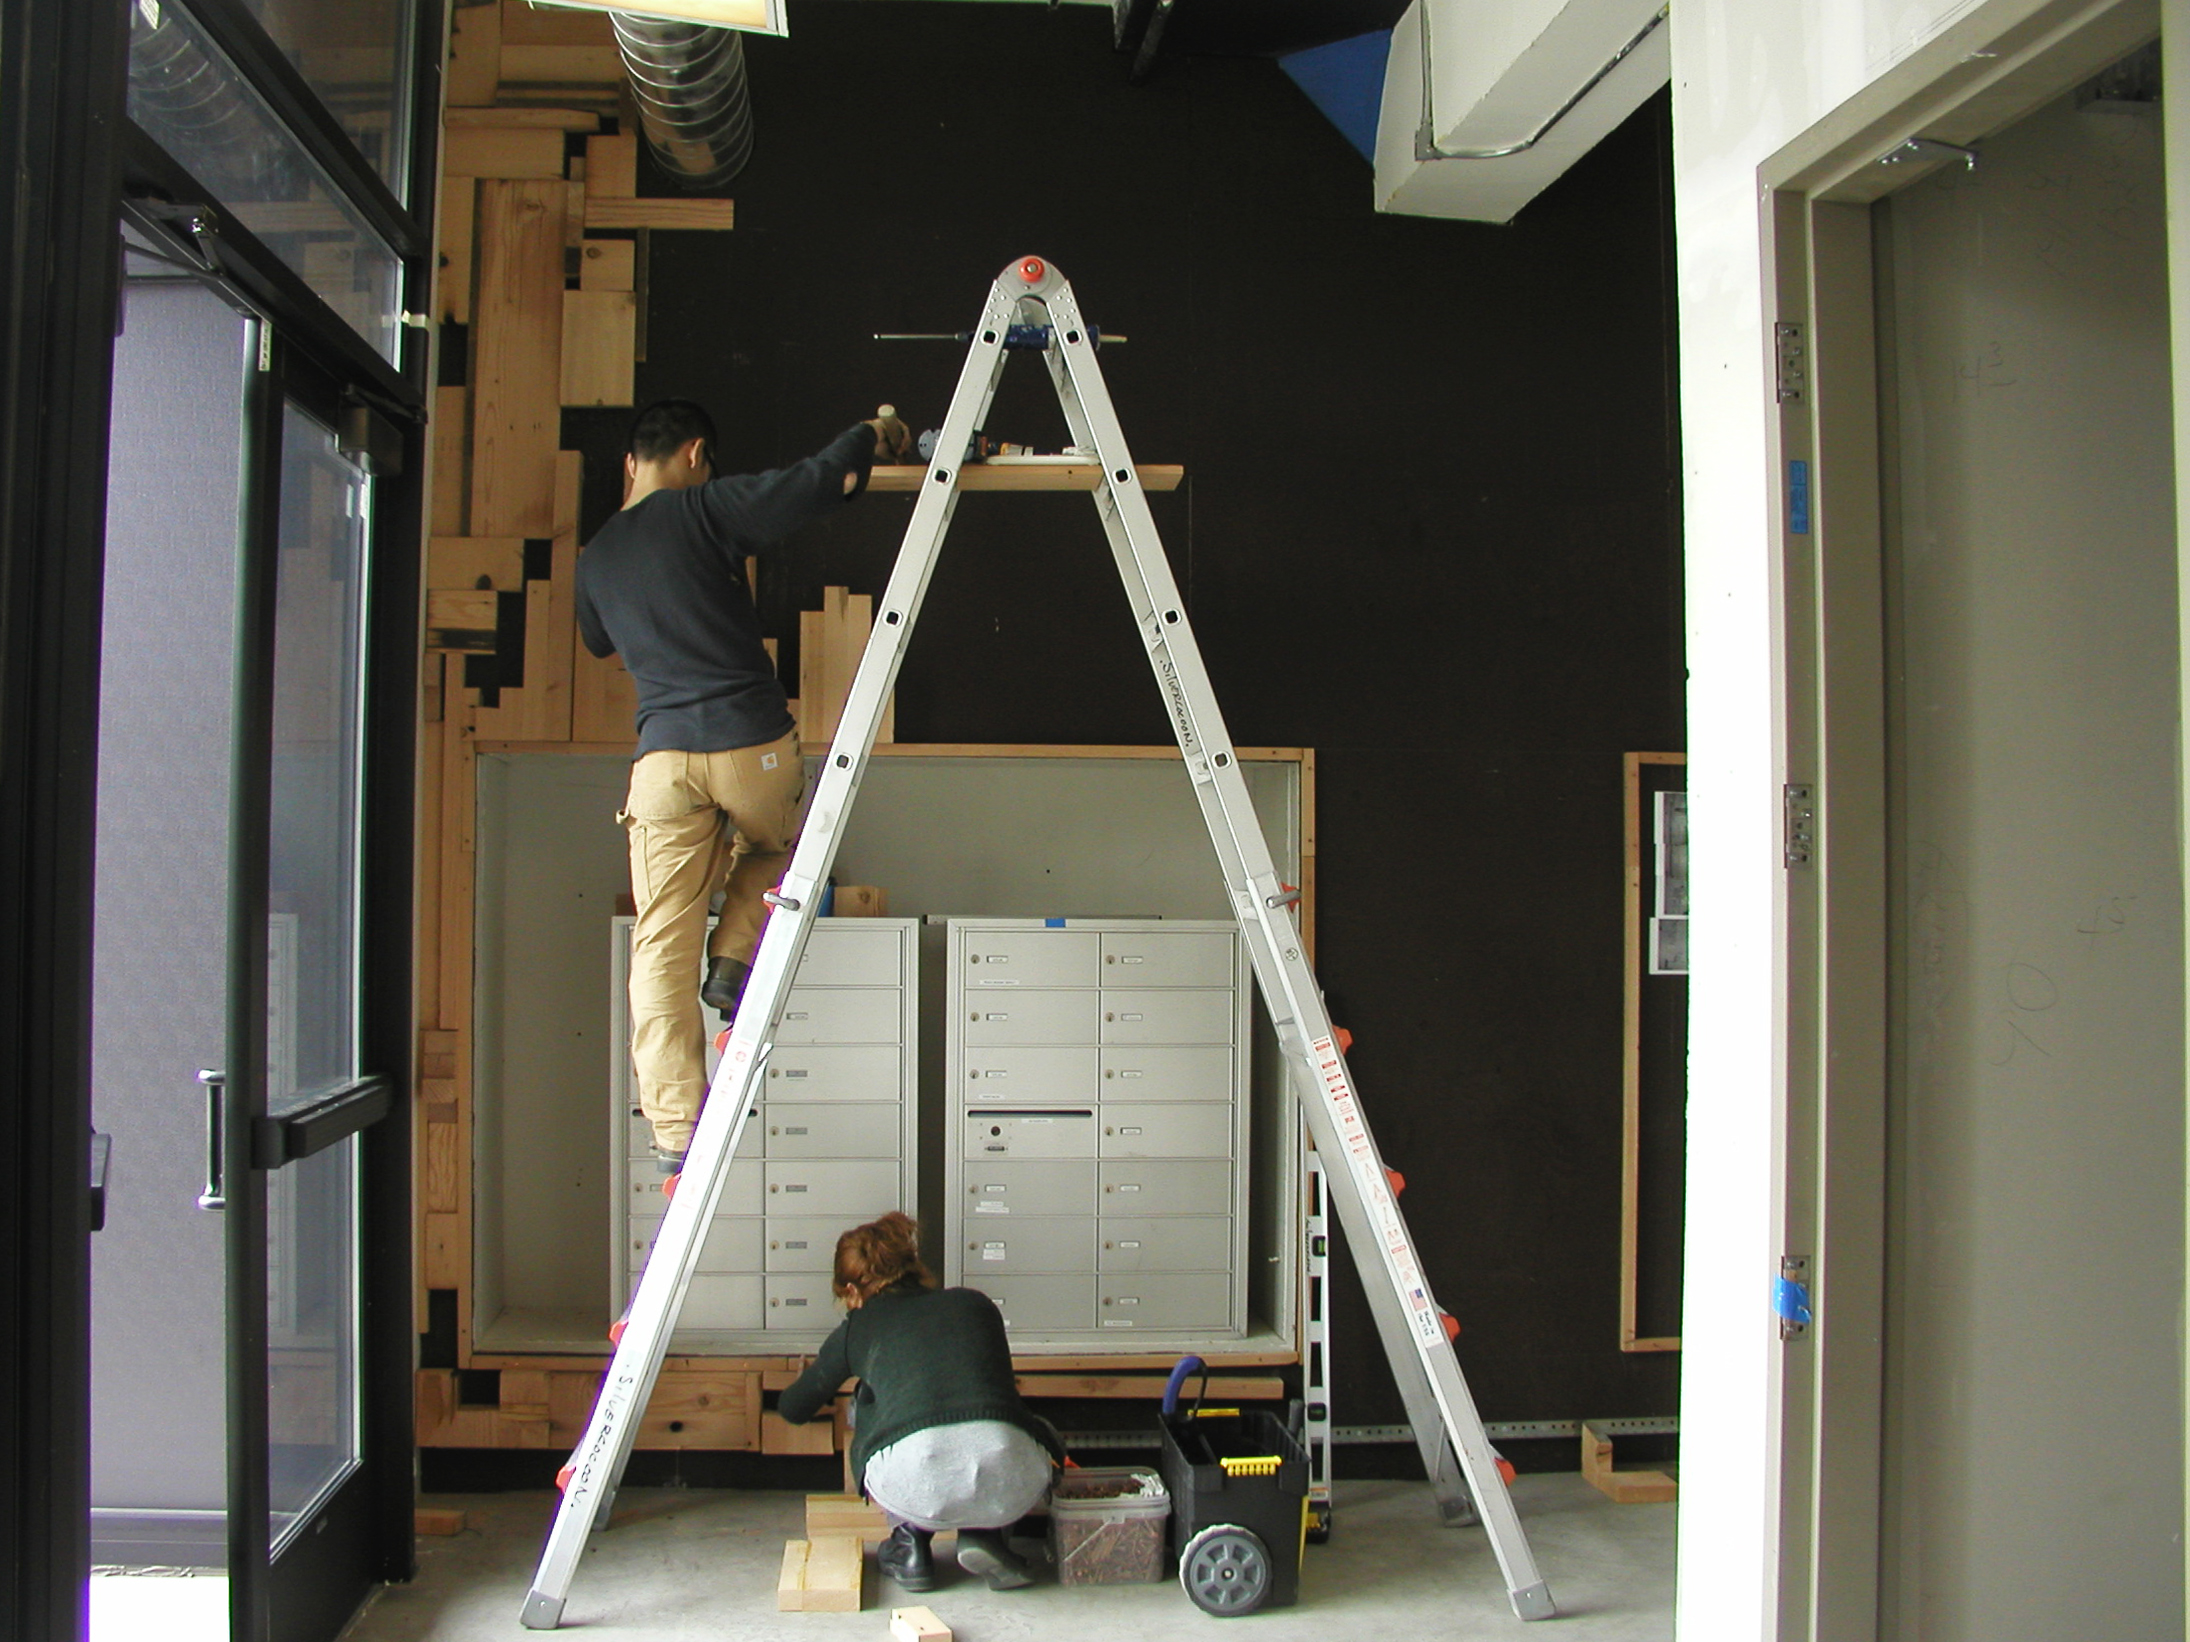 wall installation 6-7may07 017.jpg